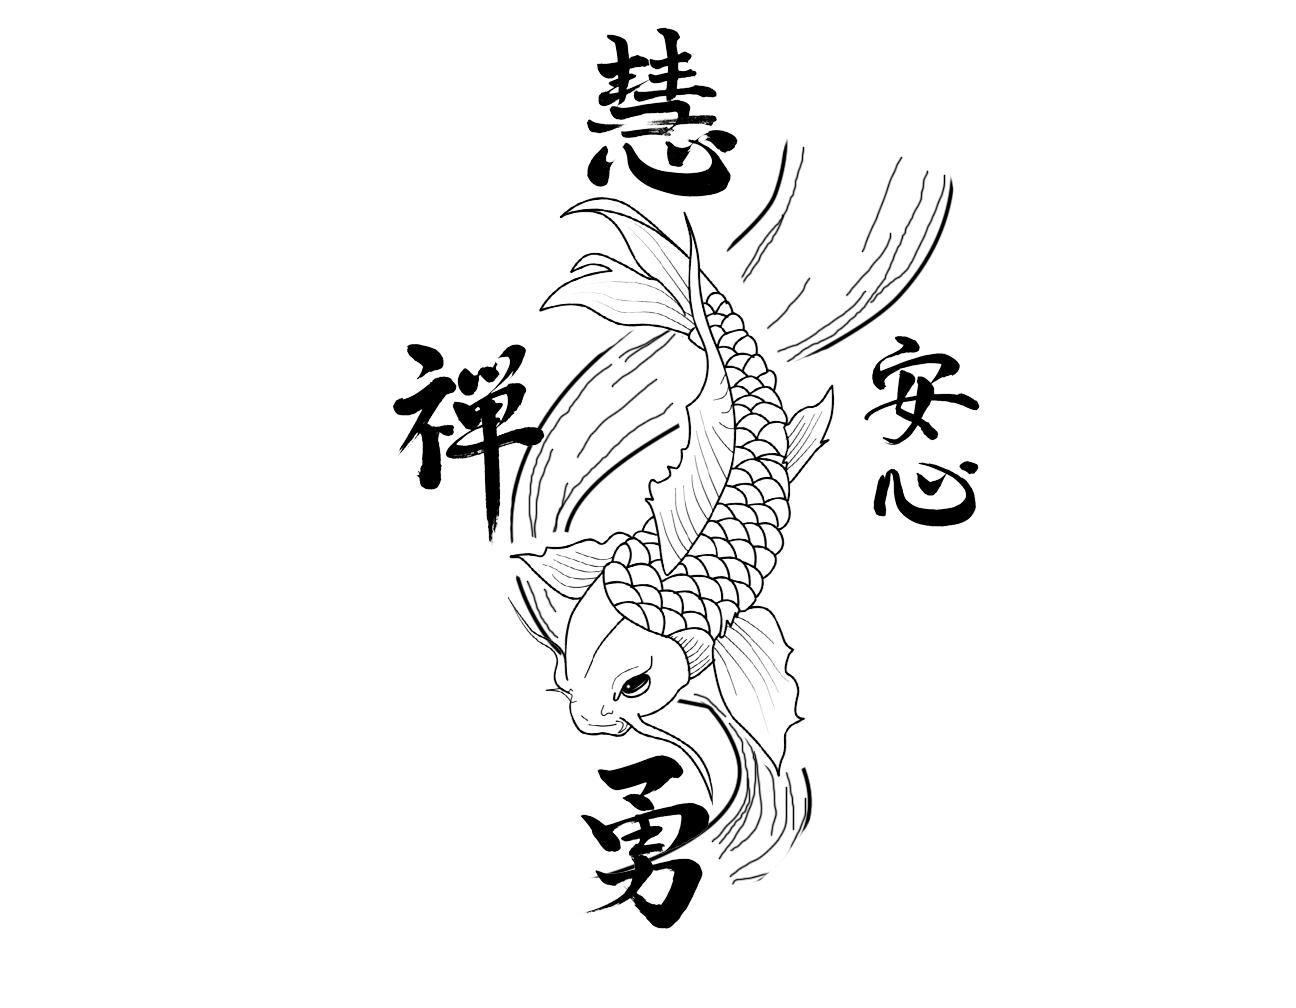 . Hdpng.com Simple Koi Fish Tattoo 3 4451Ac04890628Cbf8Abf9E622D6A7D5.png Hdpng.com  - Fish Tattoos, Transparent background PNG HD thumbnail